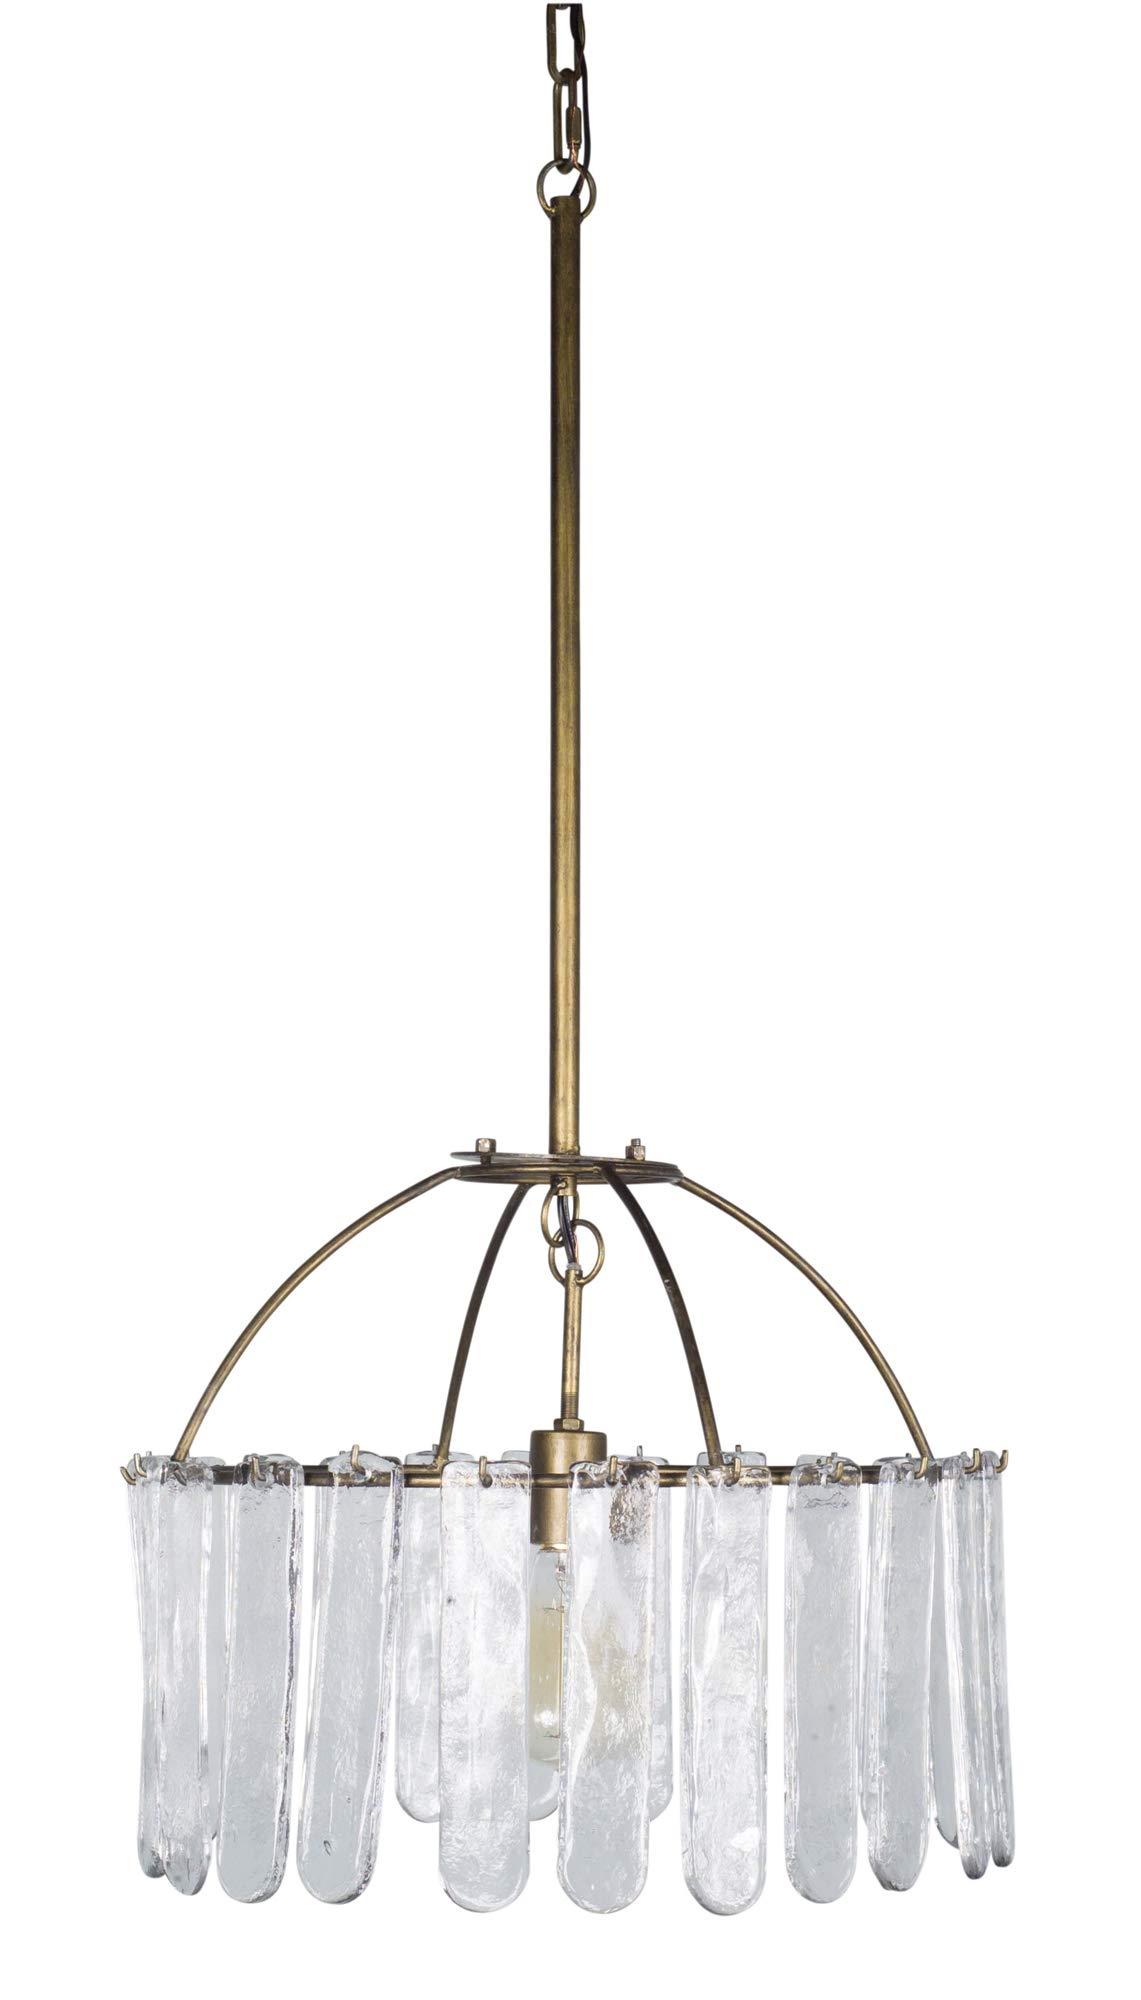 Melrose International Hanging Lamp 17'' x 34''H Iron/Glass (Max 40W)